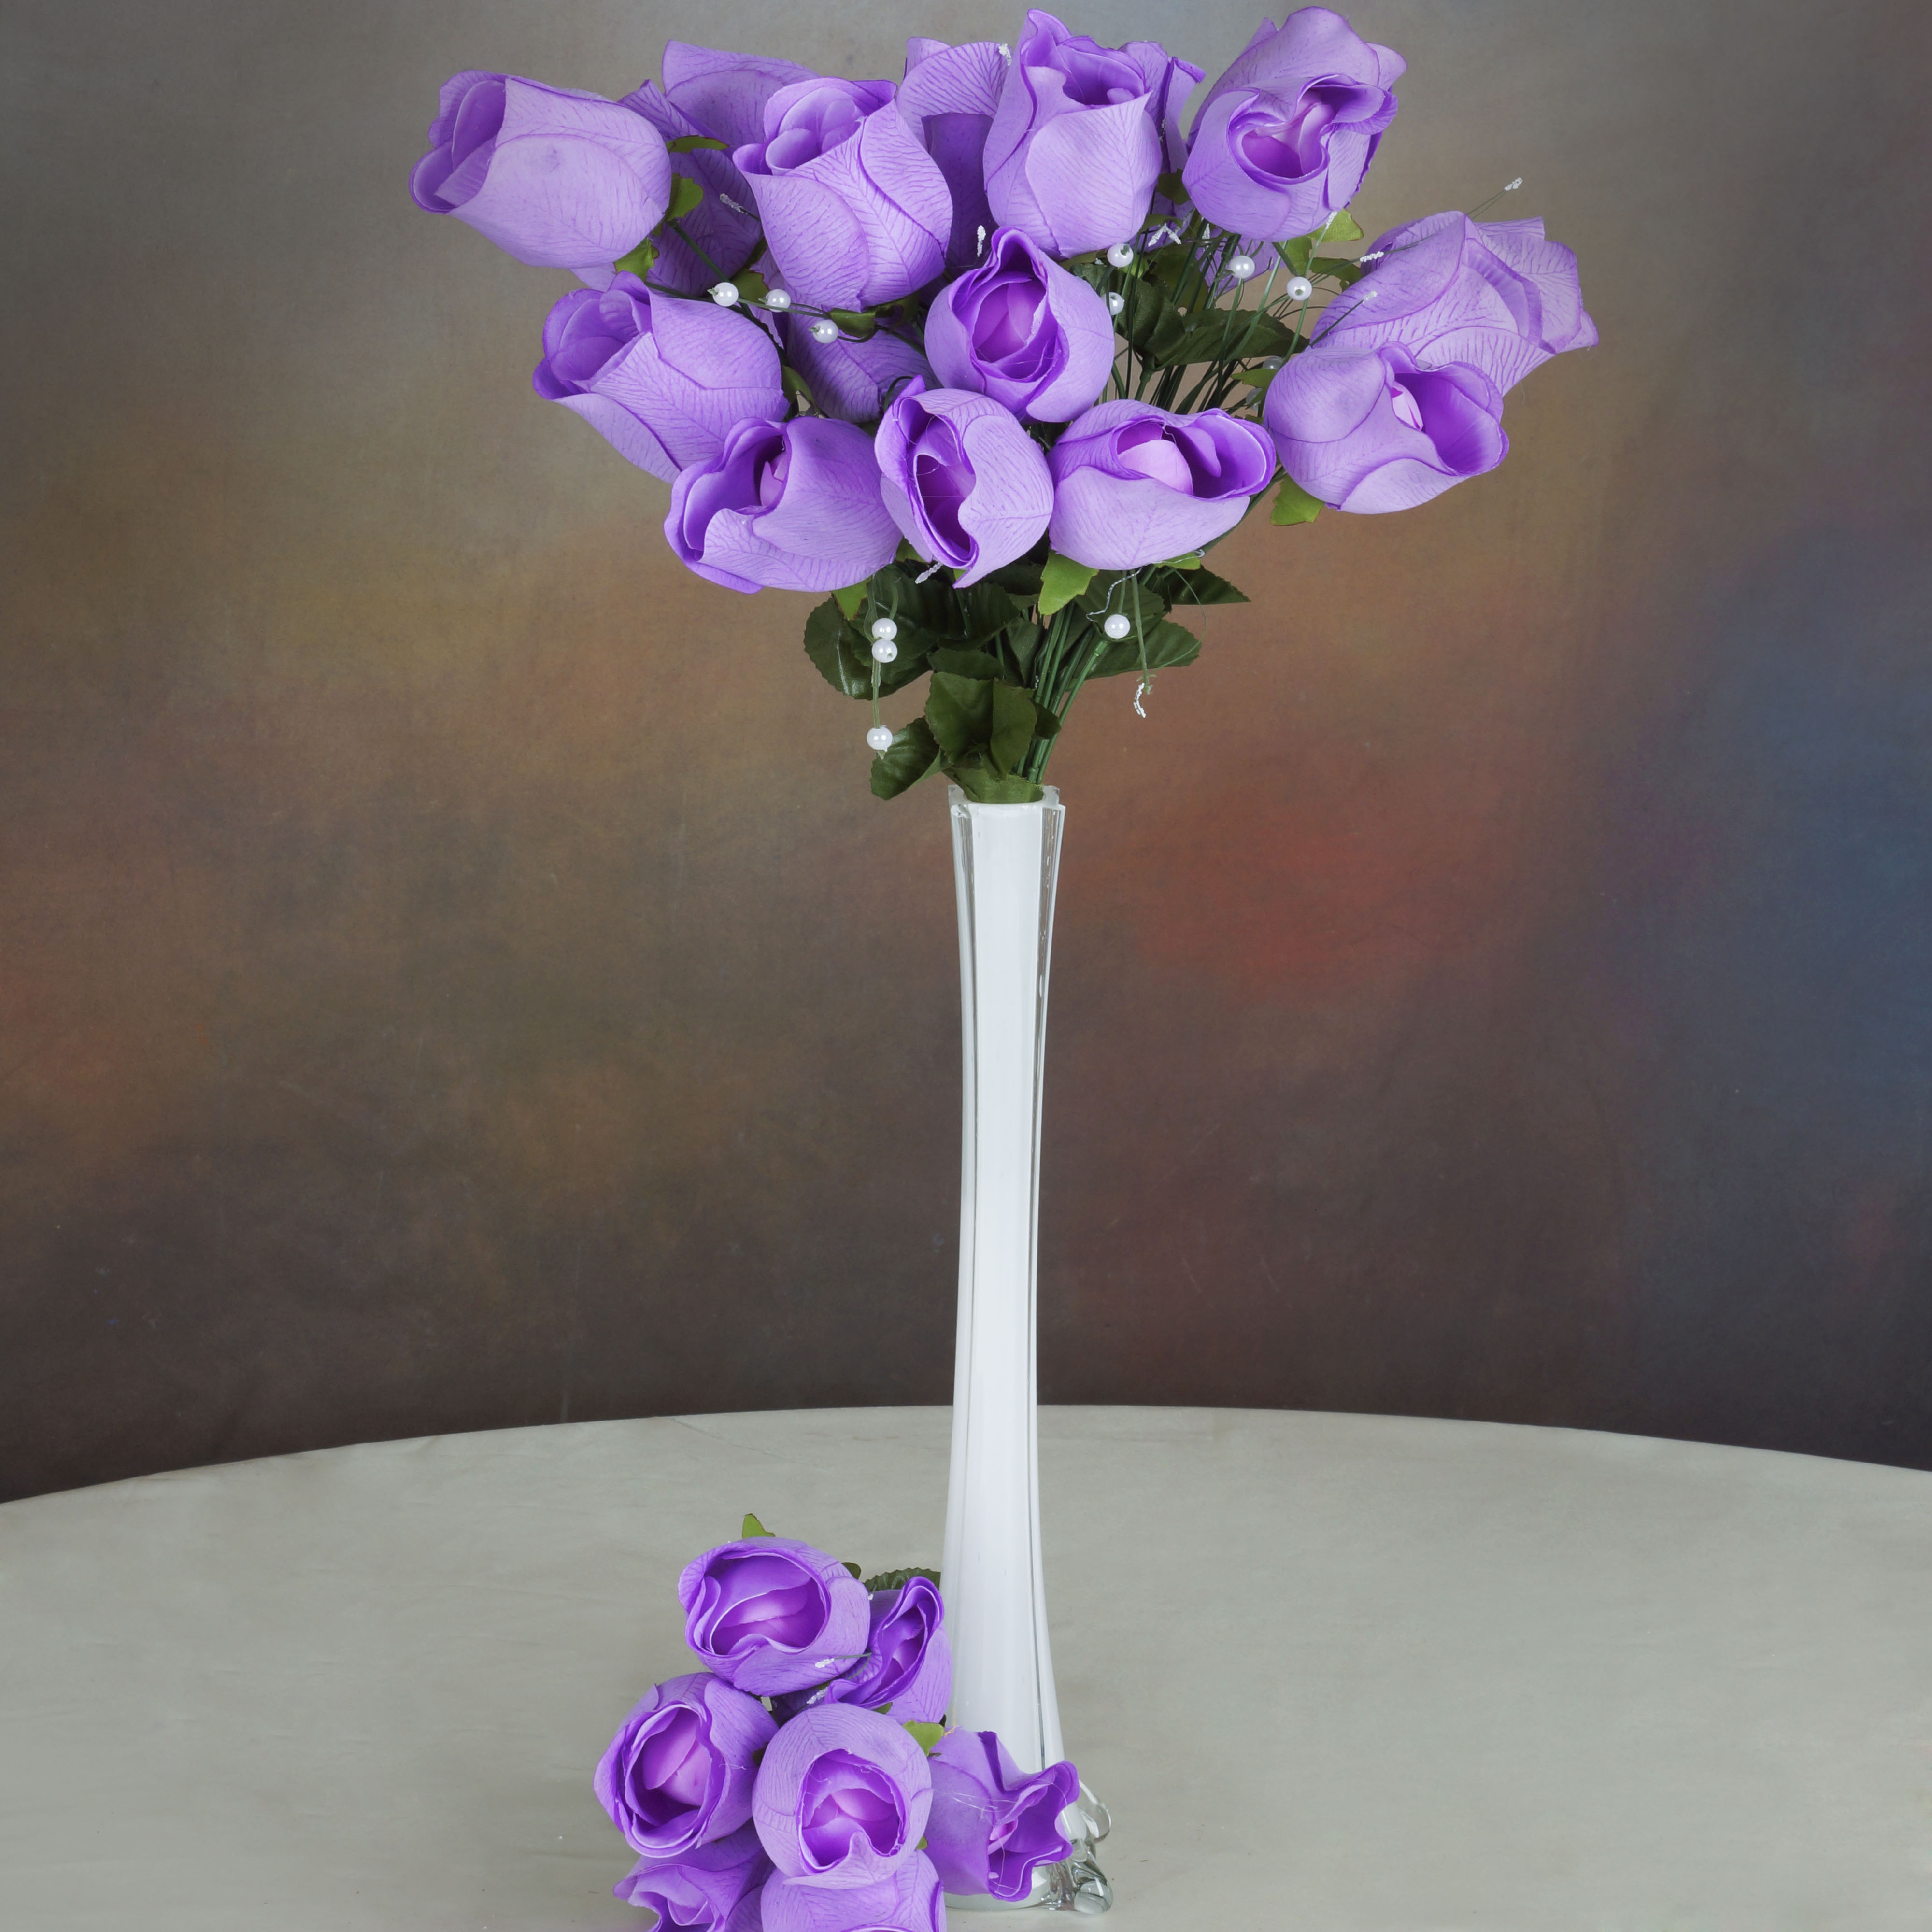 Efavormart 84 Giant Velvet Rose Buds on Long Stems for DIY Wedding Bouquets Centerpieces Arrangements Party Home Decorations Supply